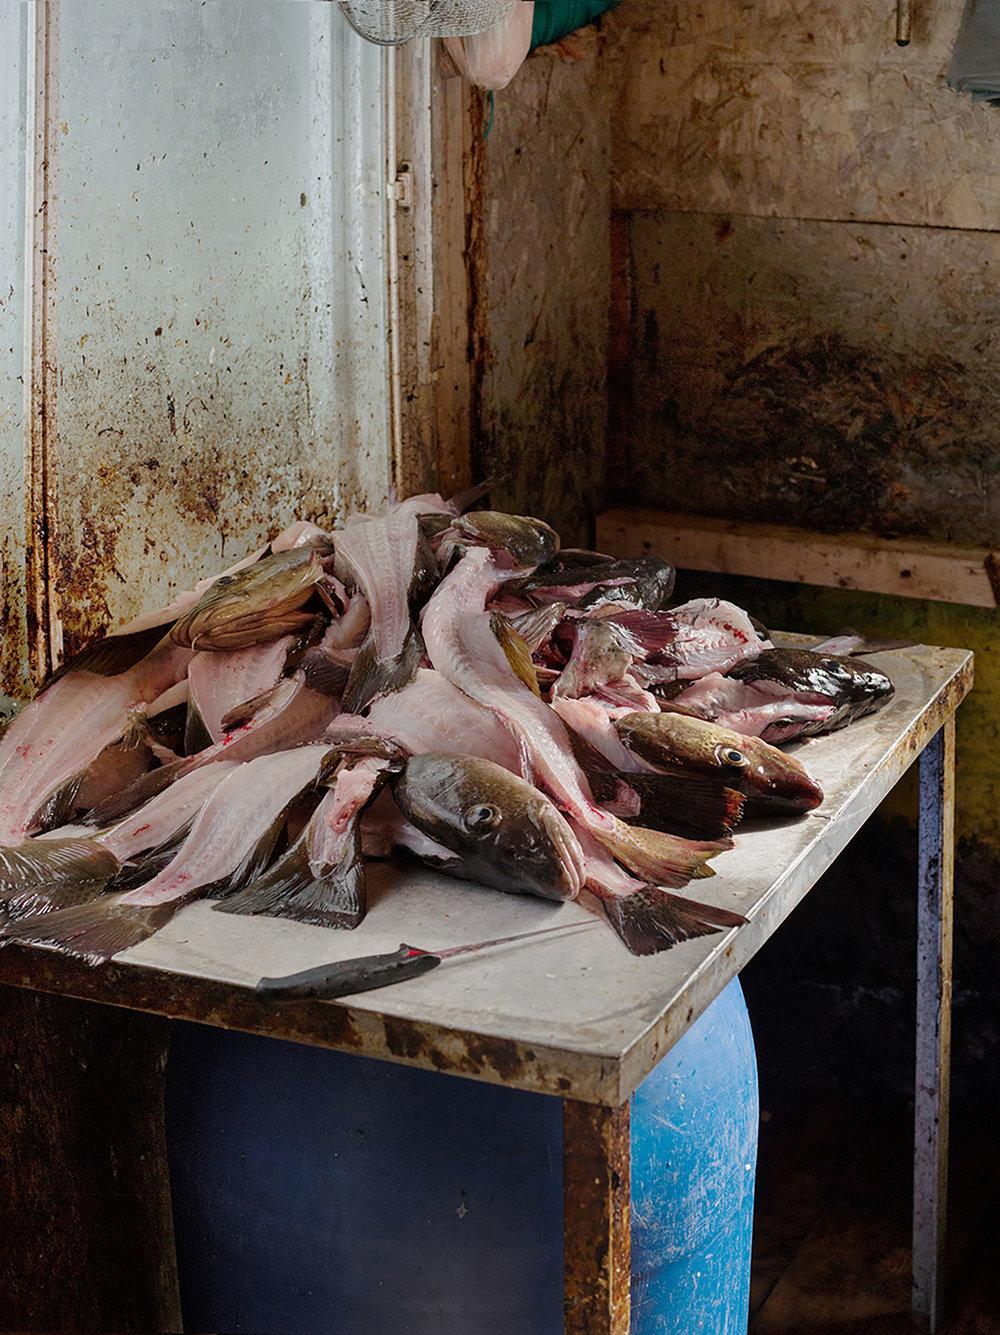 Cleaning Cod, Greenspond, Newfoundland , 2017, archival inkjet print